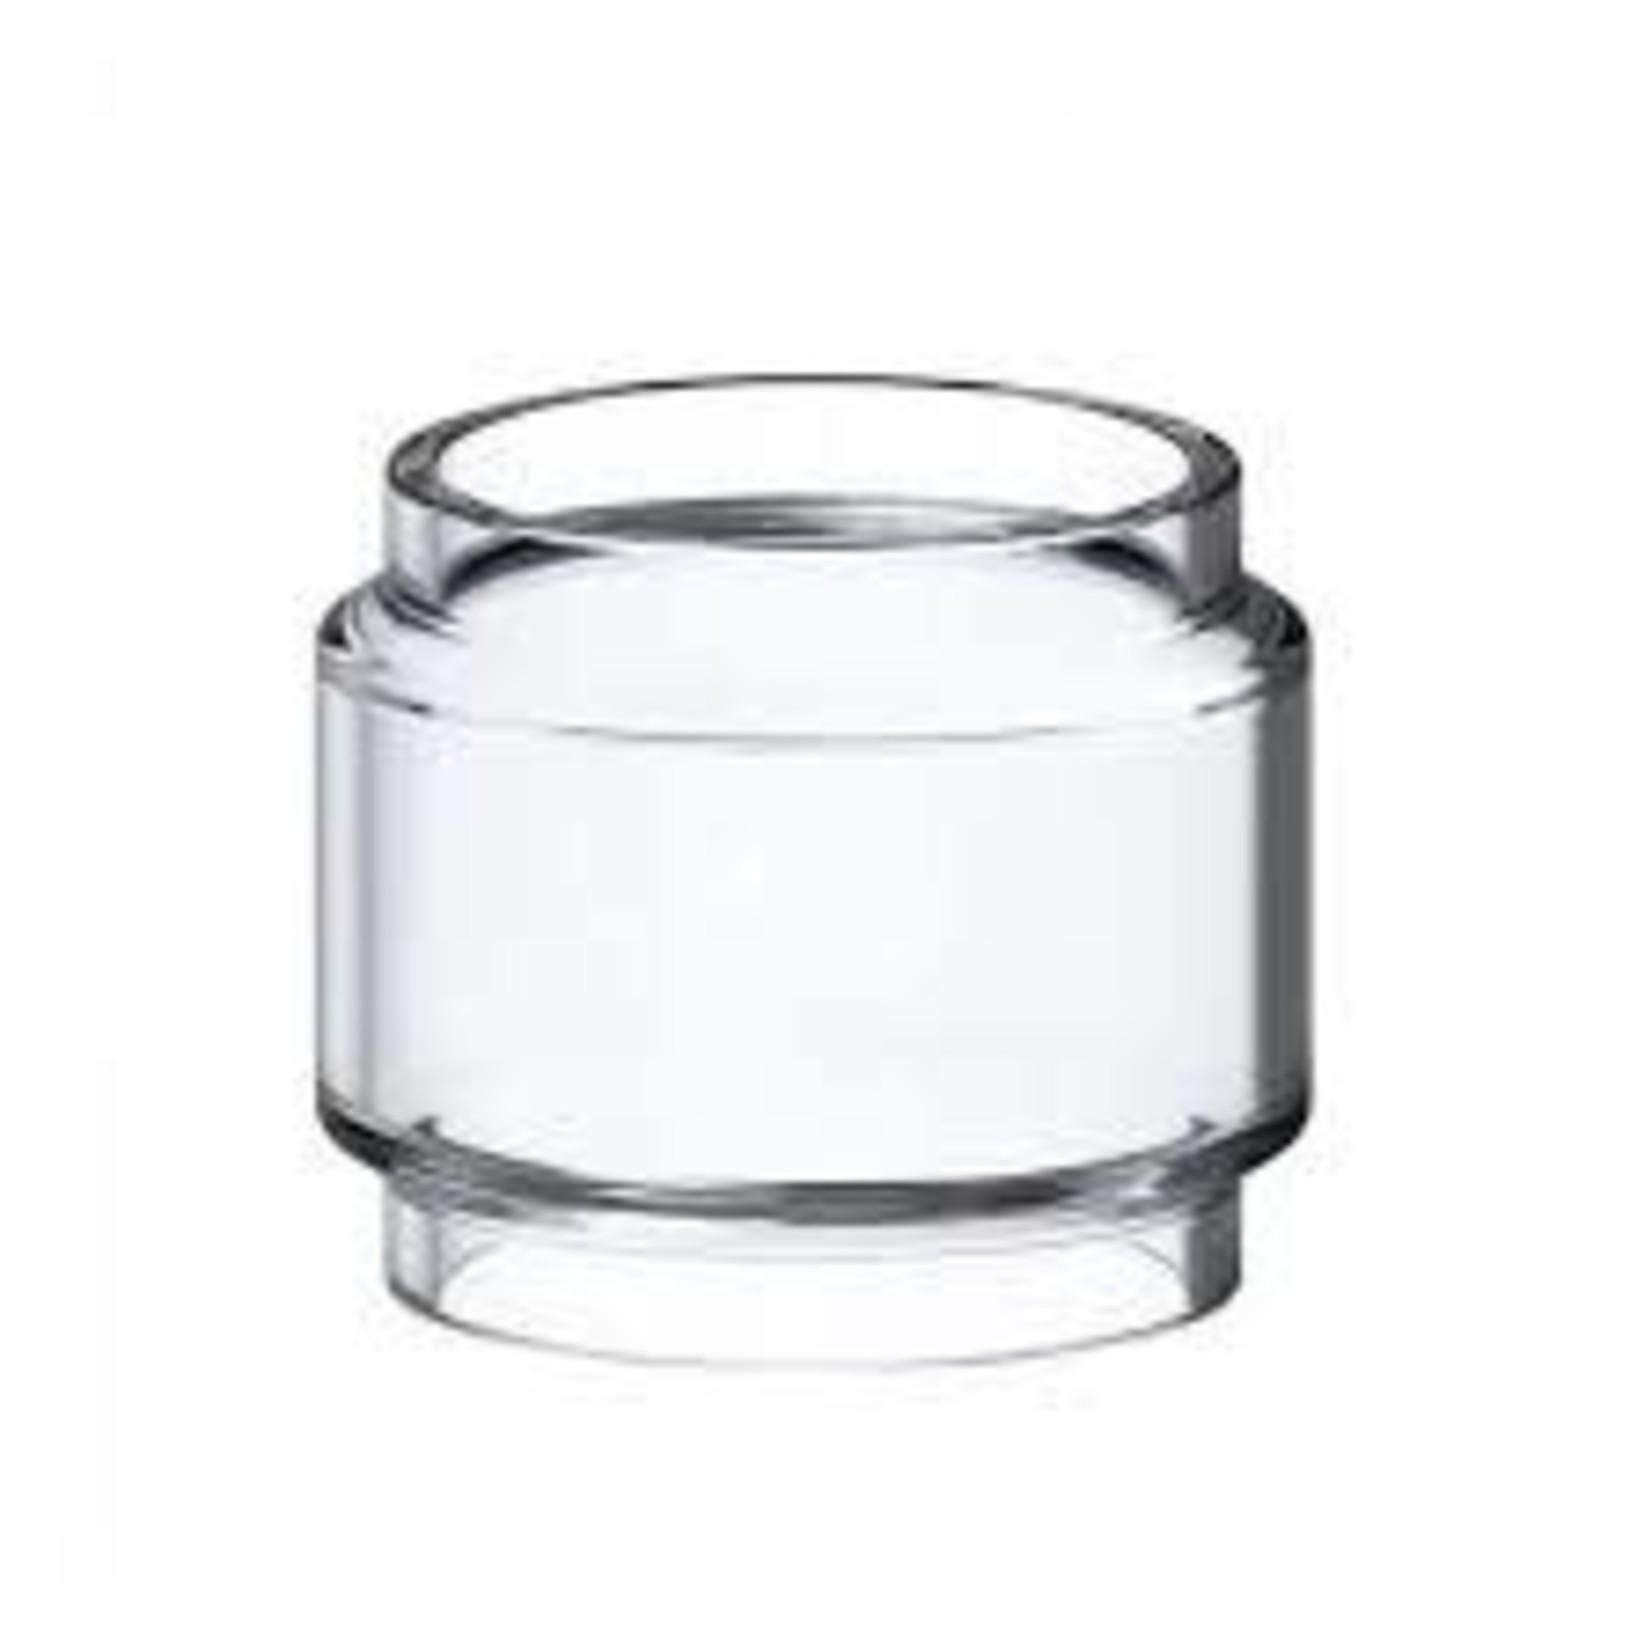 1:1 Smok Priv / Stick M17 Replacement Glass